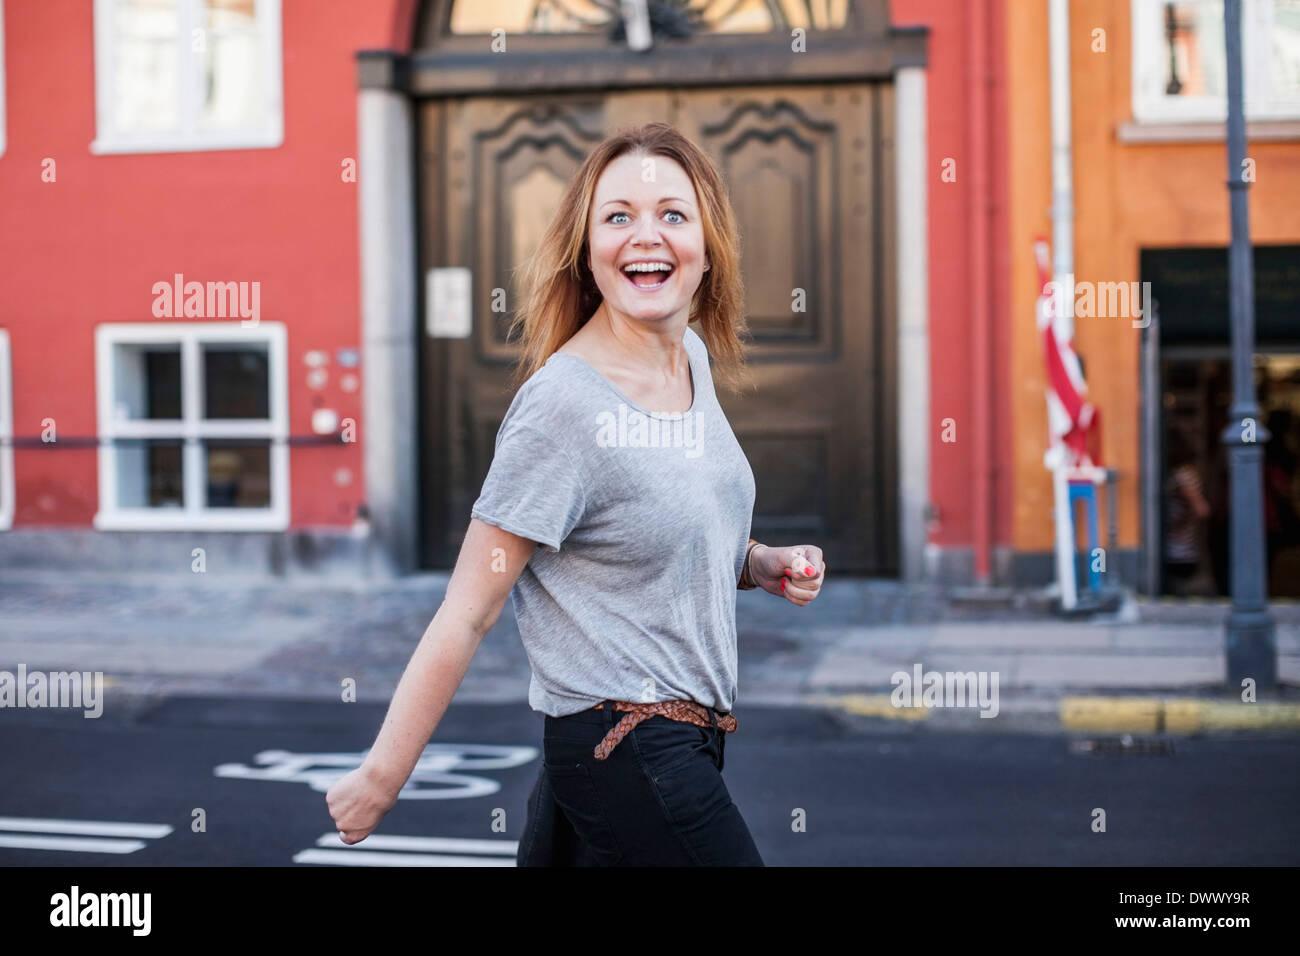 Portrait of happy mid adult woman walking on city street Stock Photo